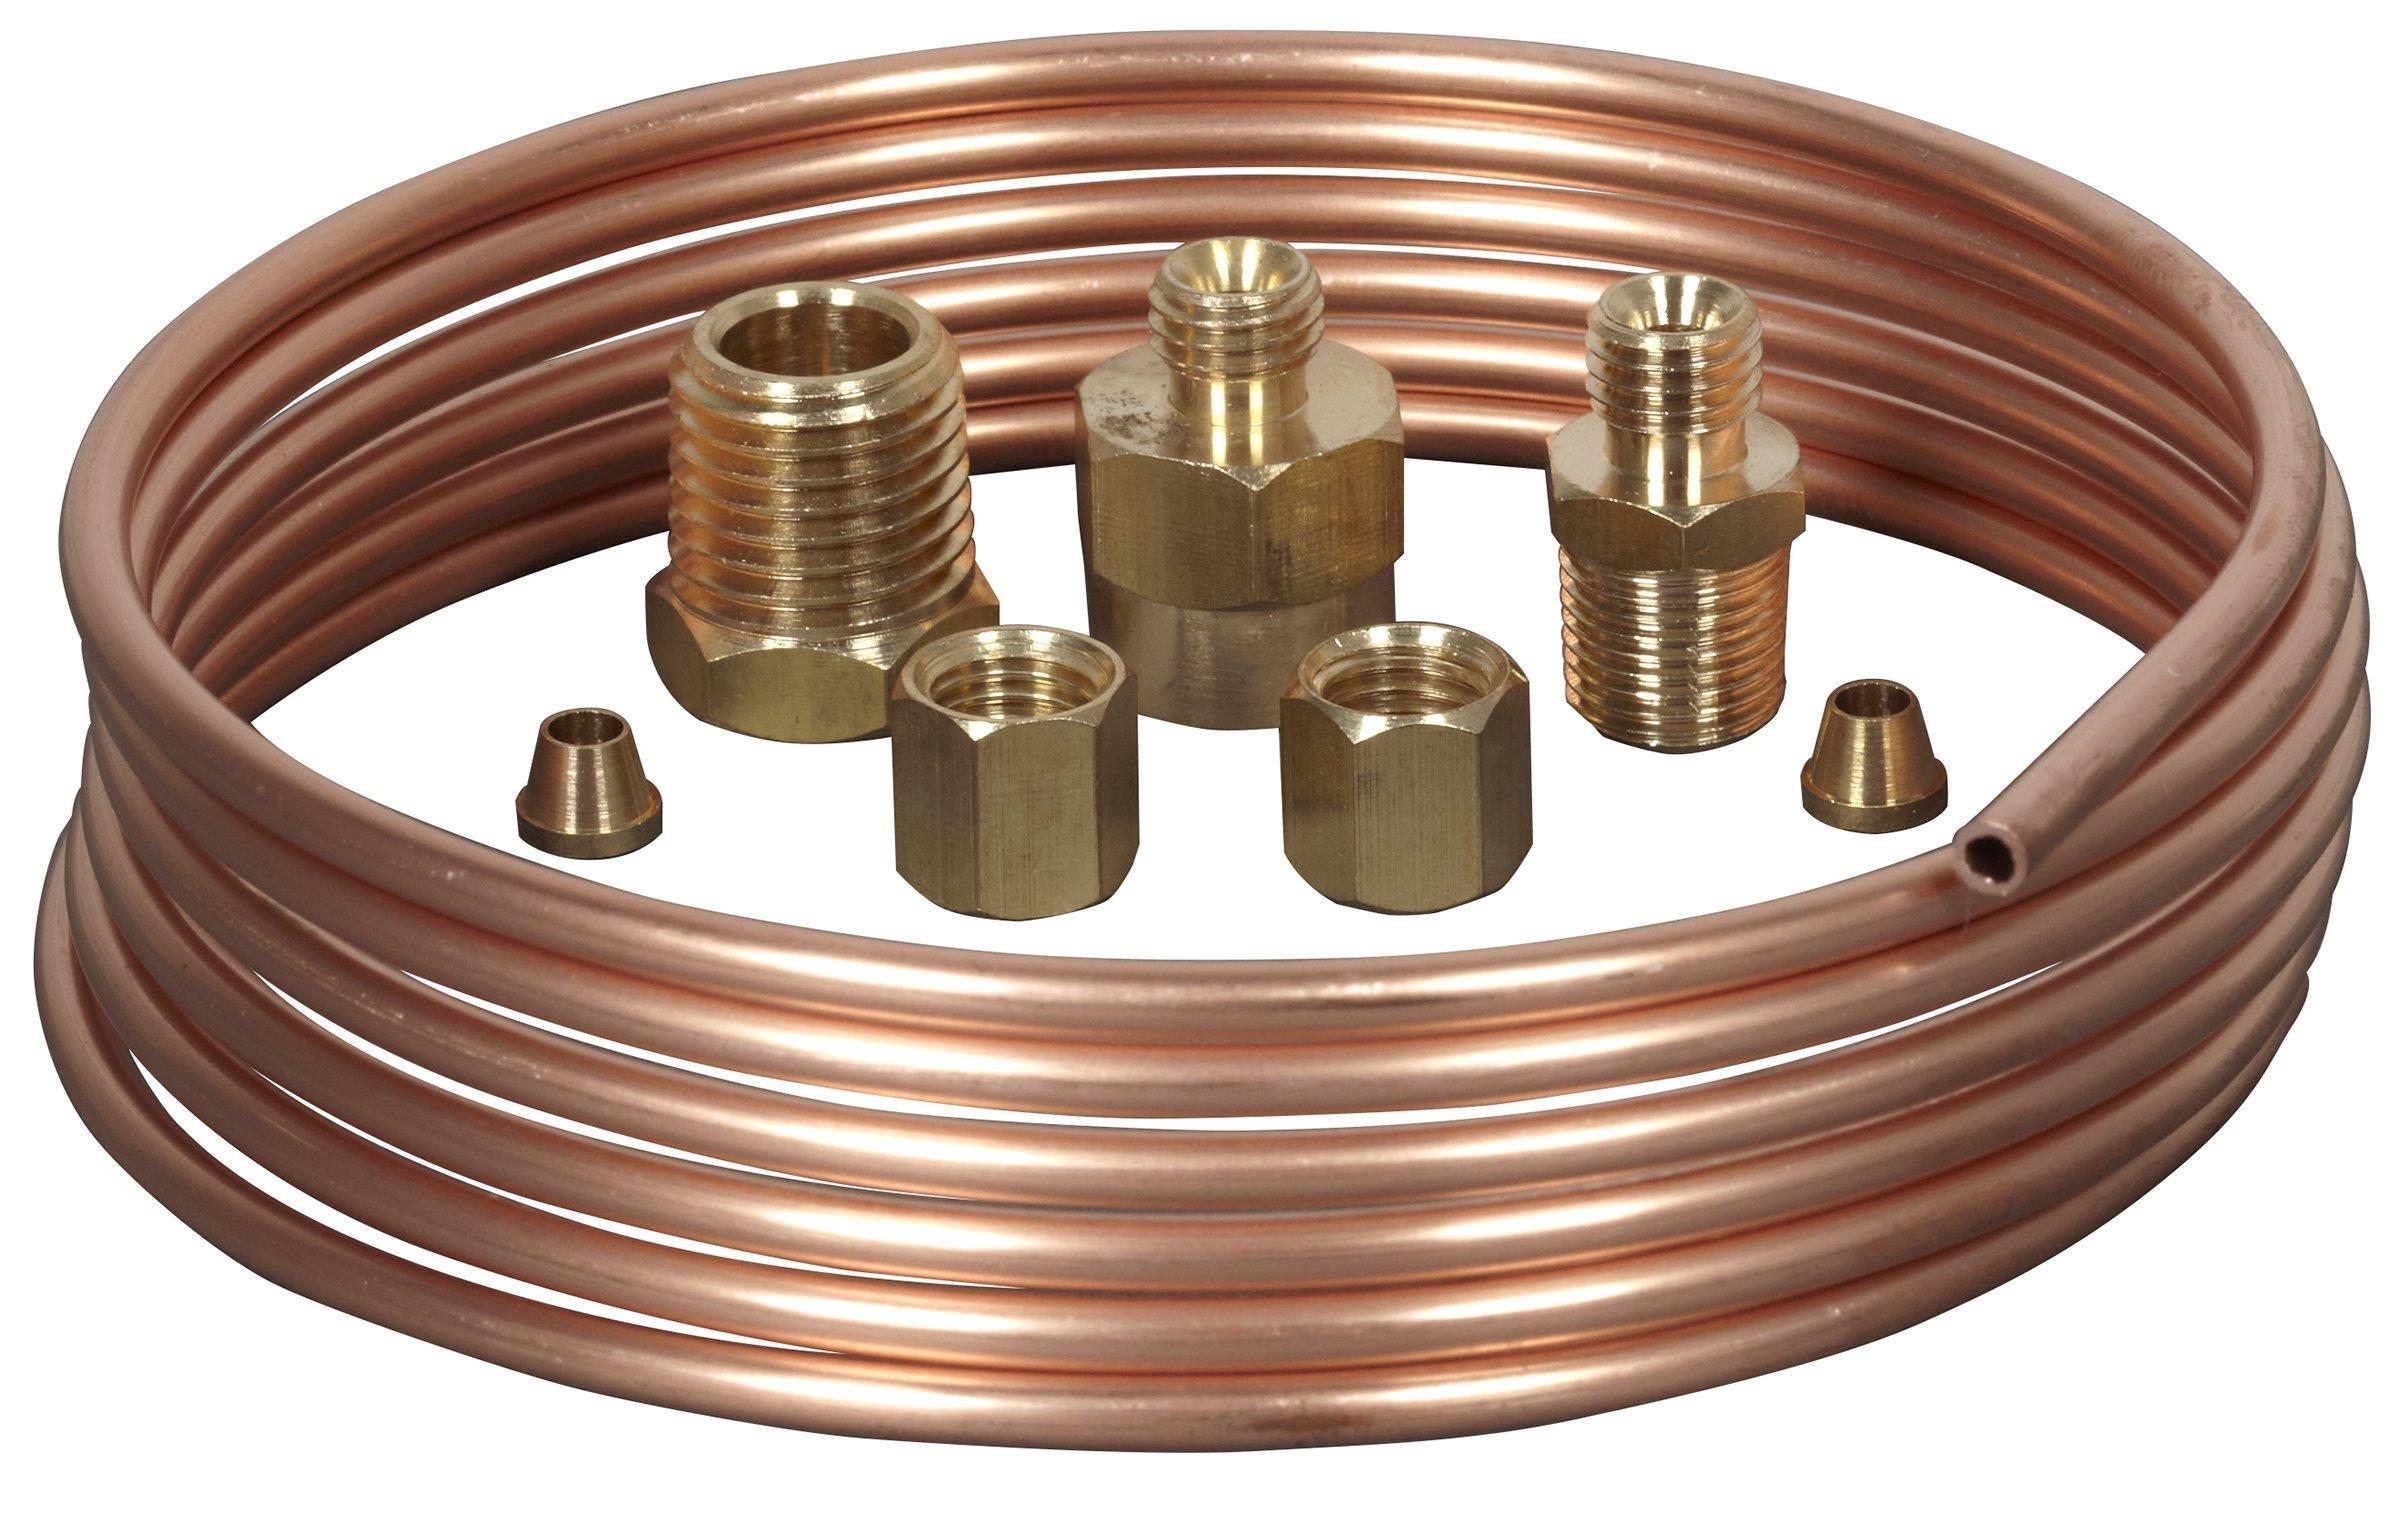 Bosch SP0F000012 Copper Tubing Installation Kit by Bosch